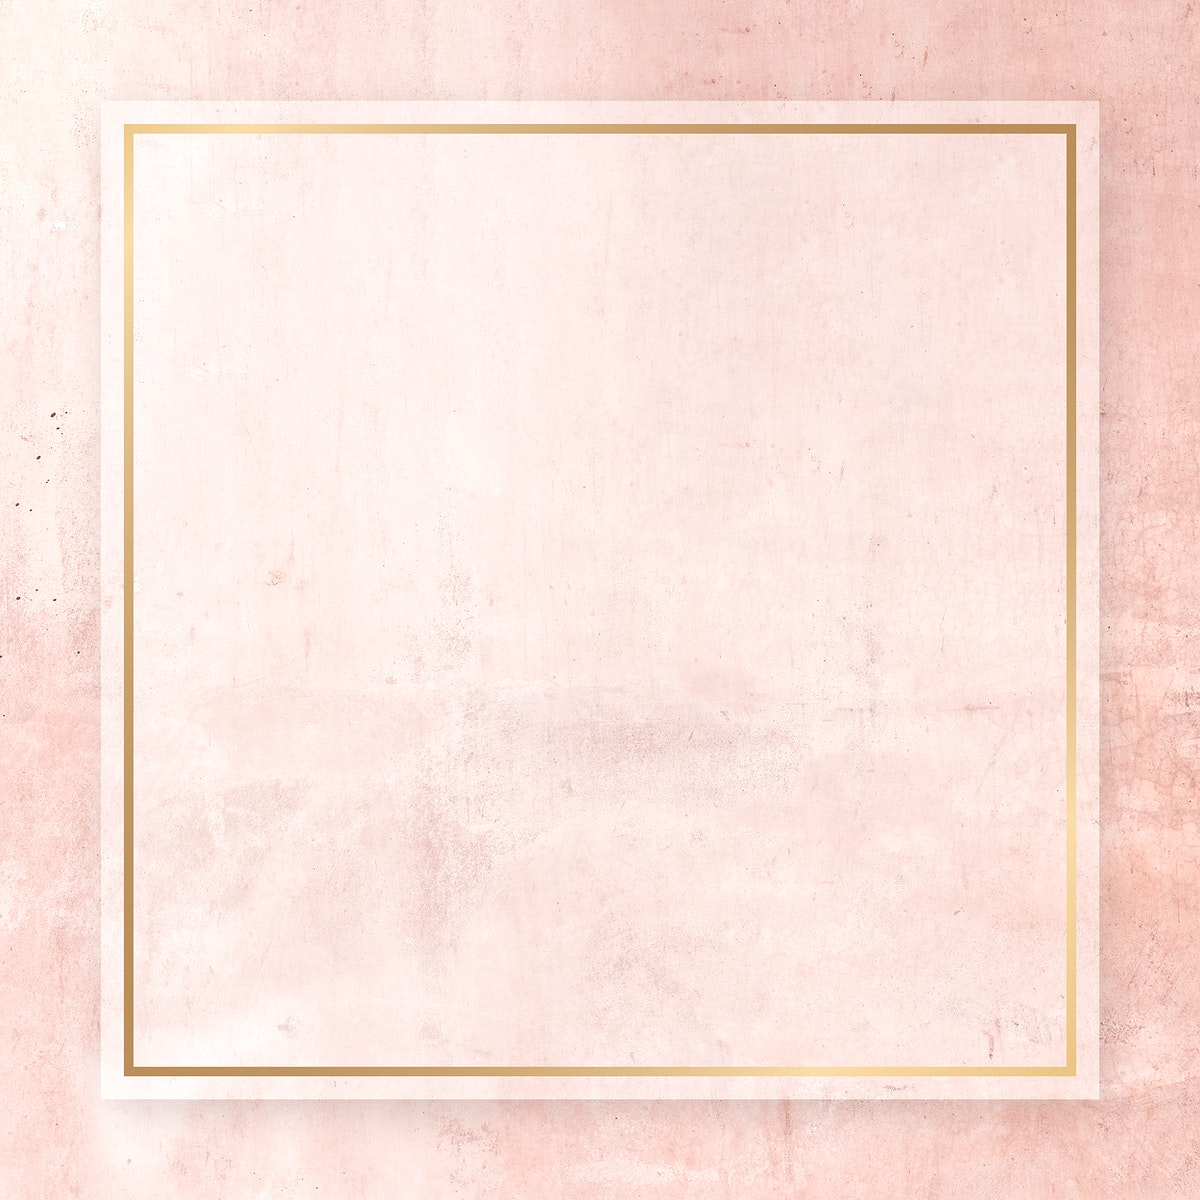 Blank golden frame on a pink background